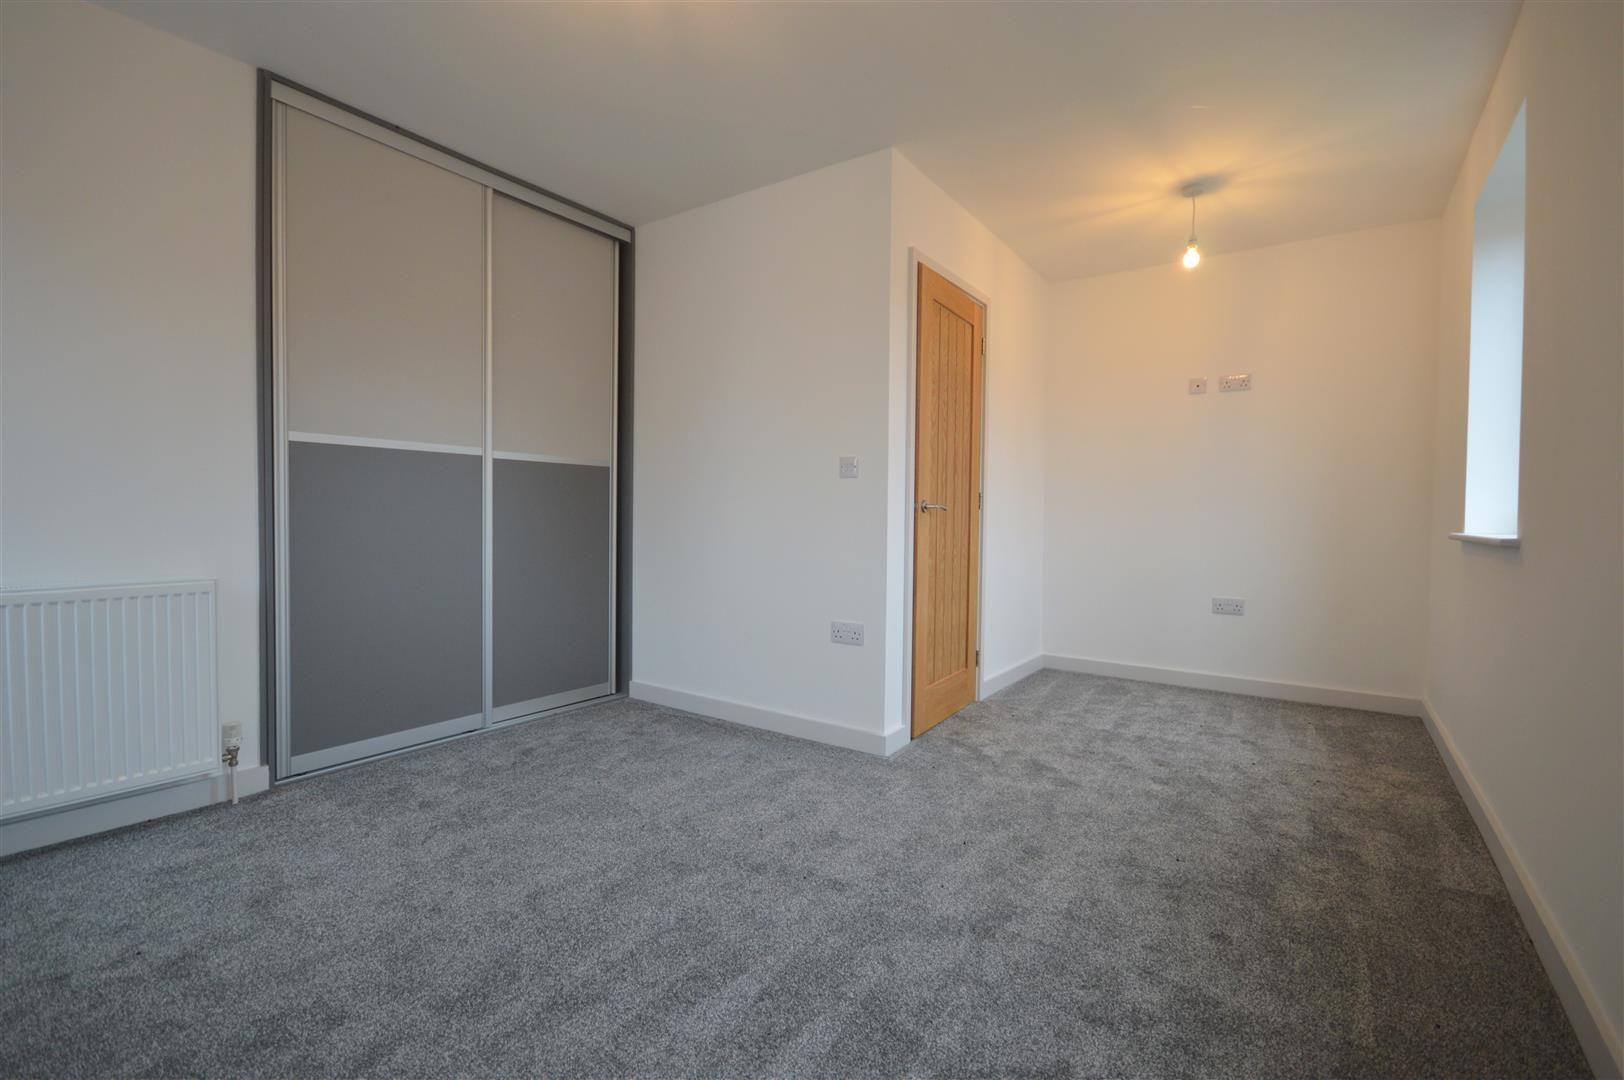 2 bed detached for sale in Leominster 7